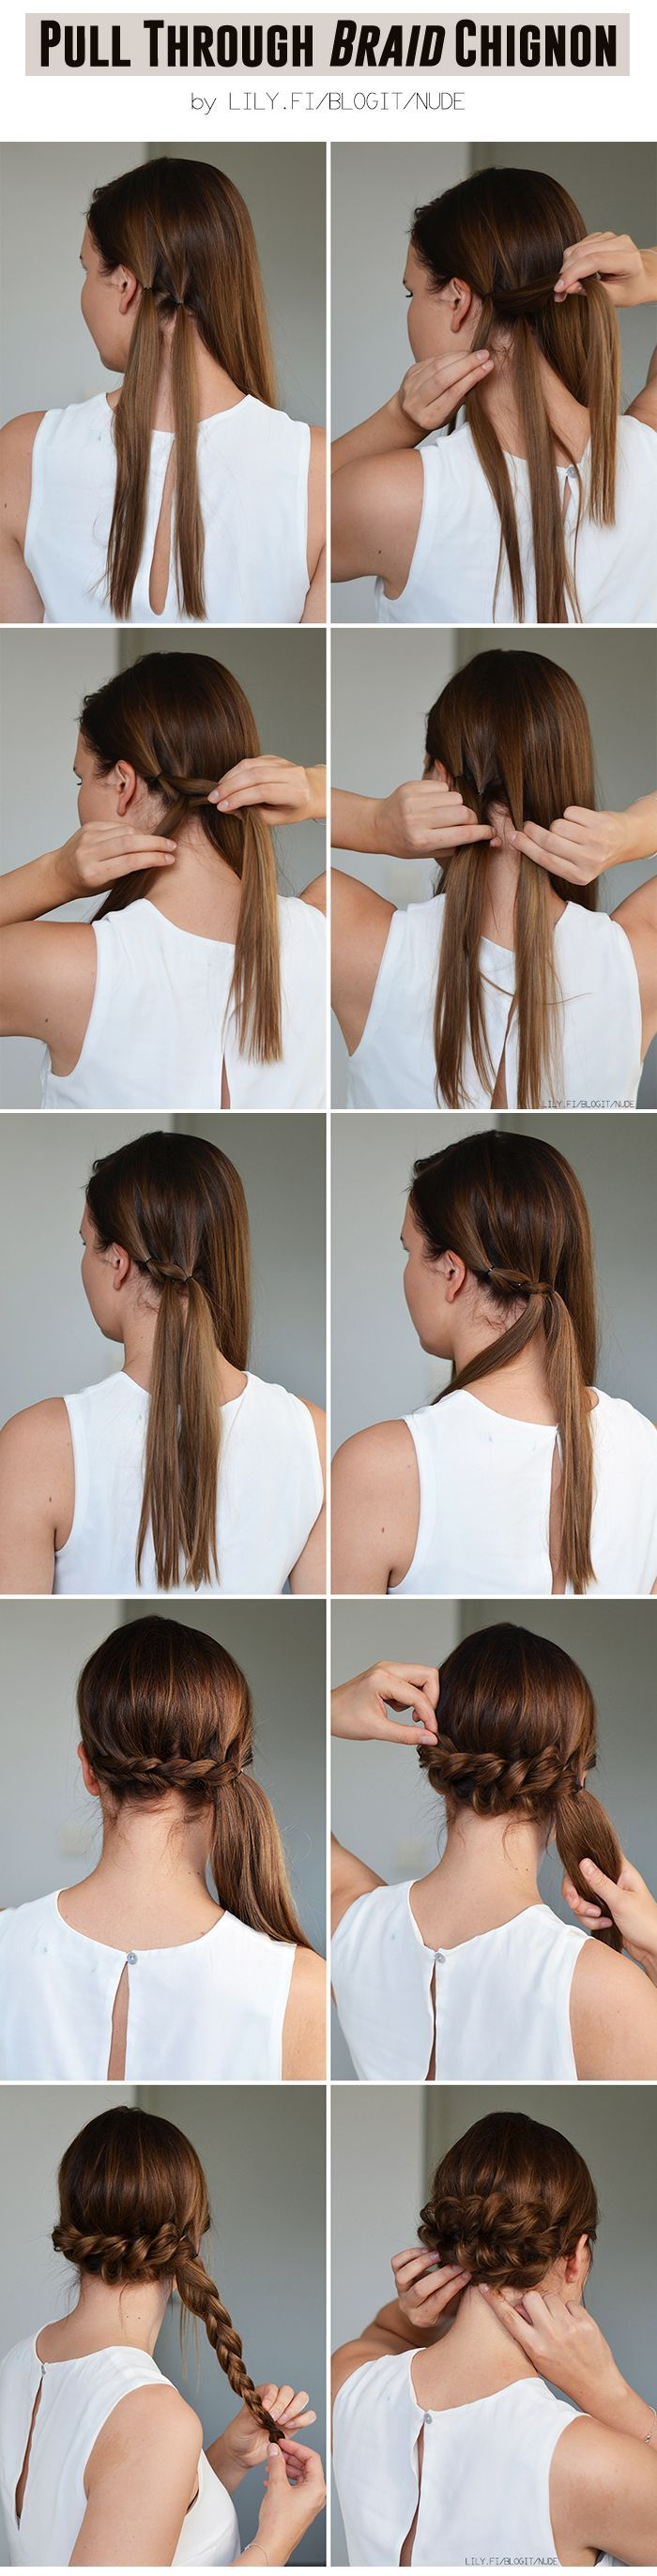 42 best HAIR ARTS images on Pinterest